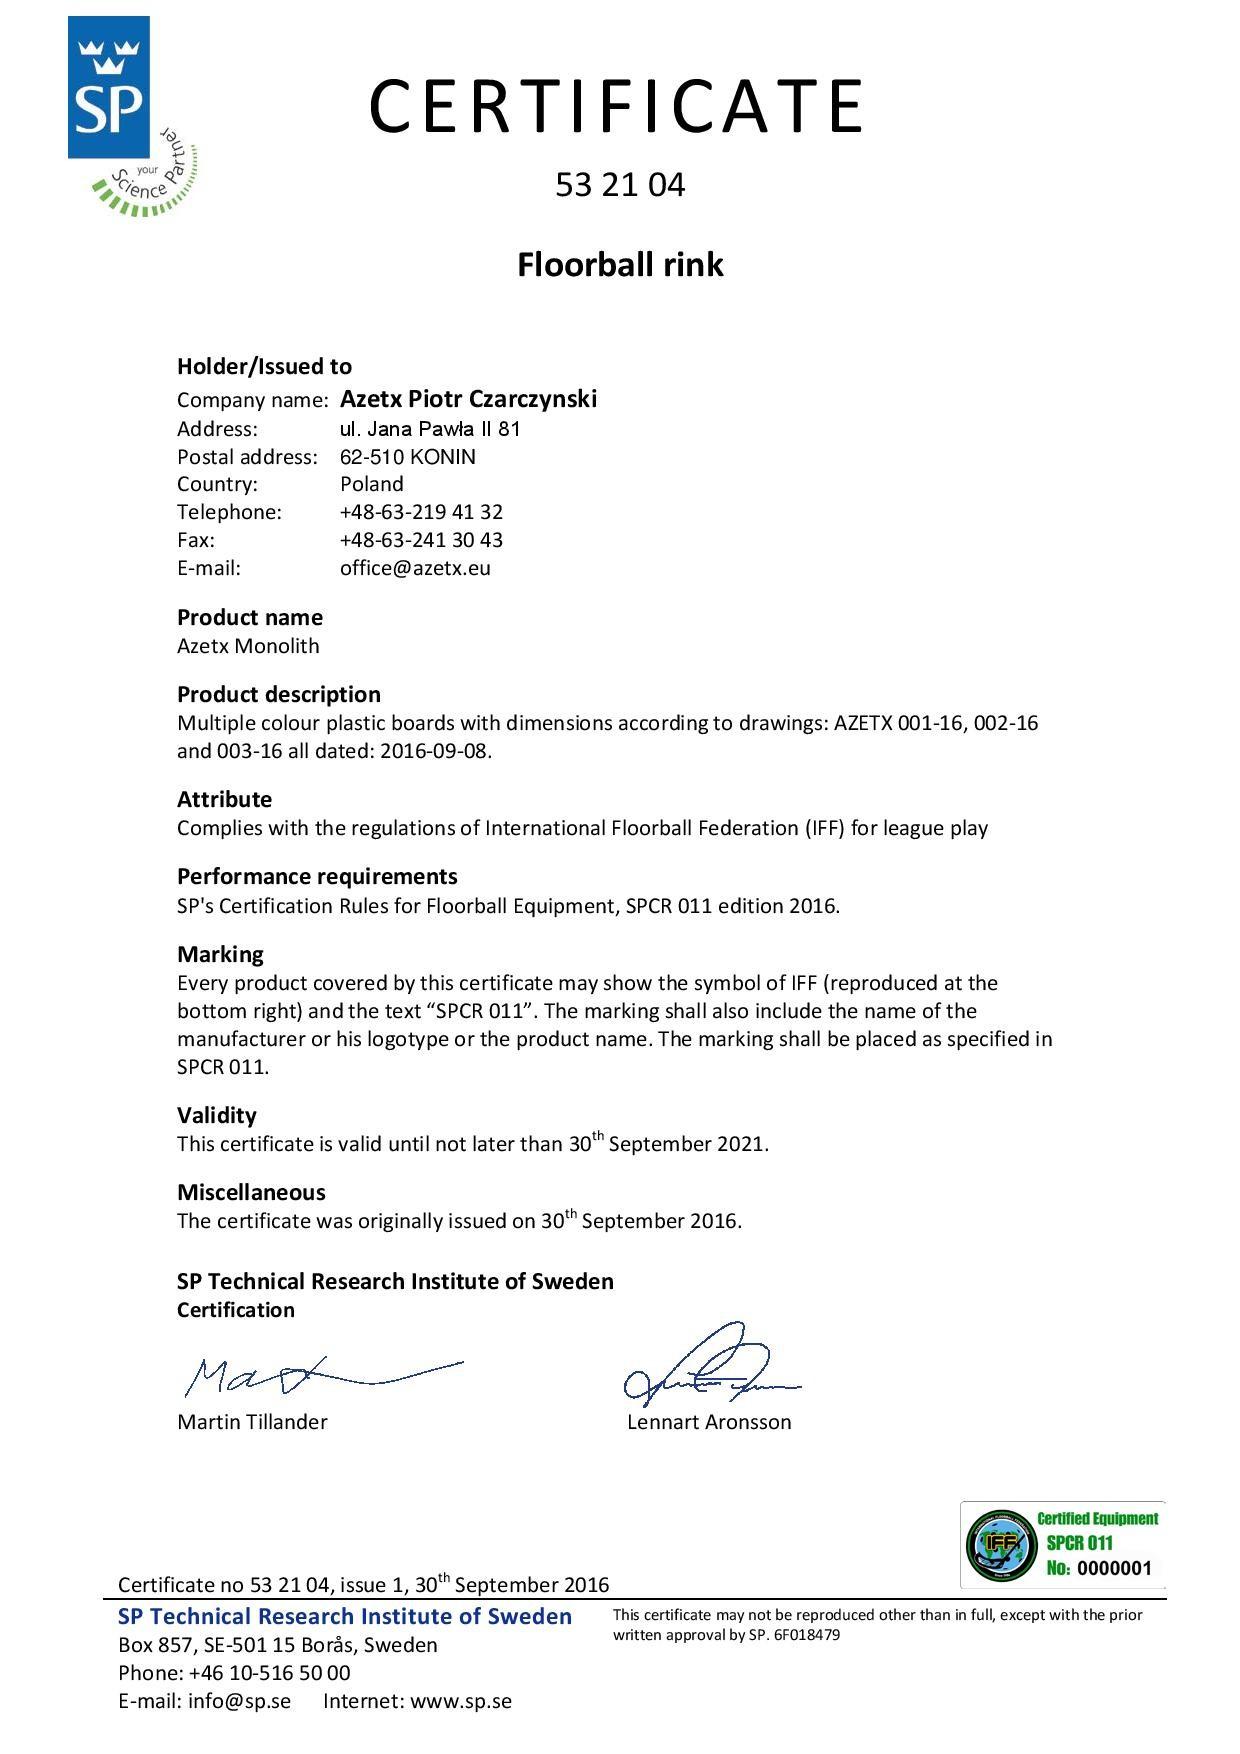 AZETX MONOLITH Floorball Rink 20m x 40m with IFF